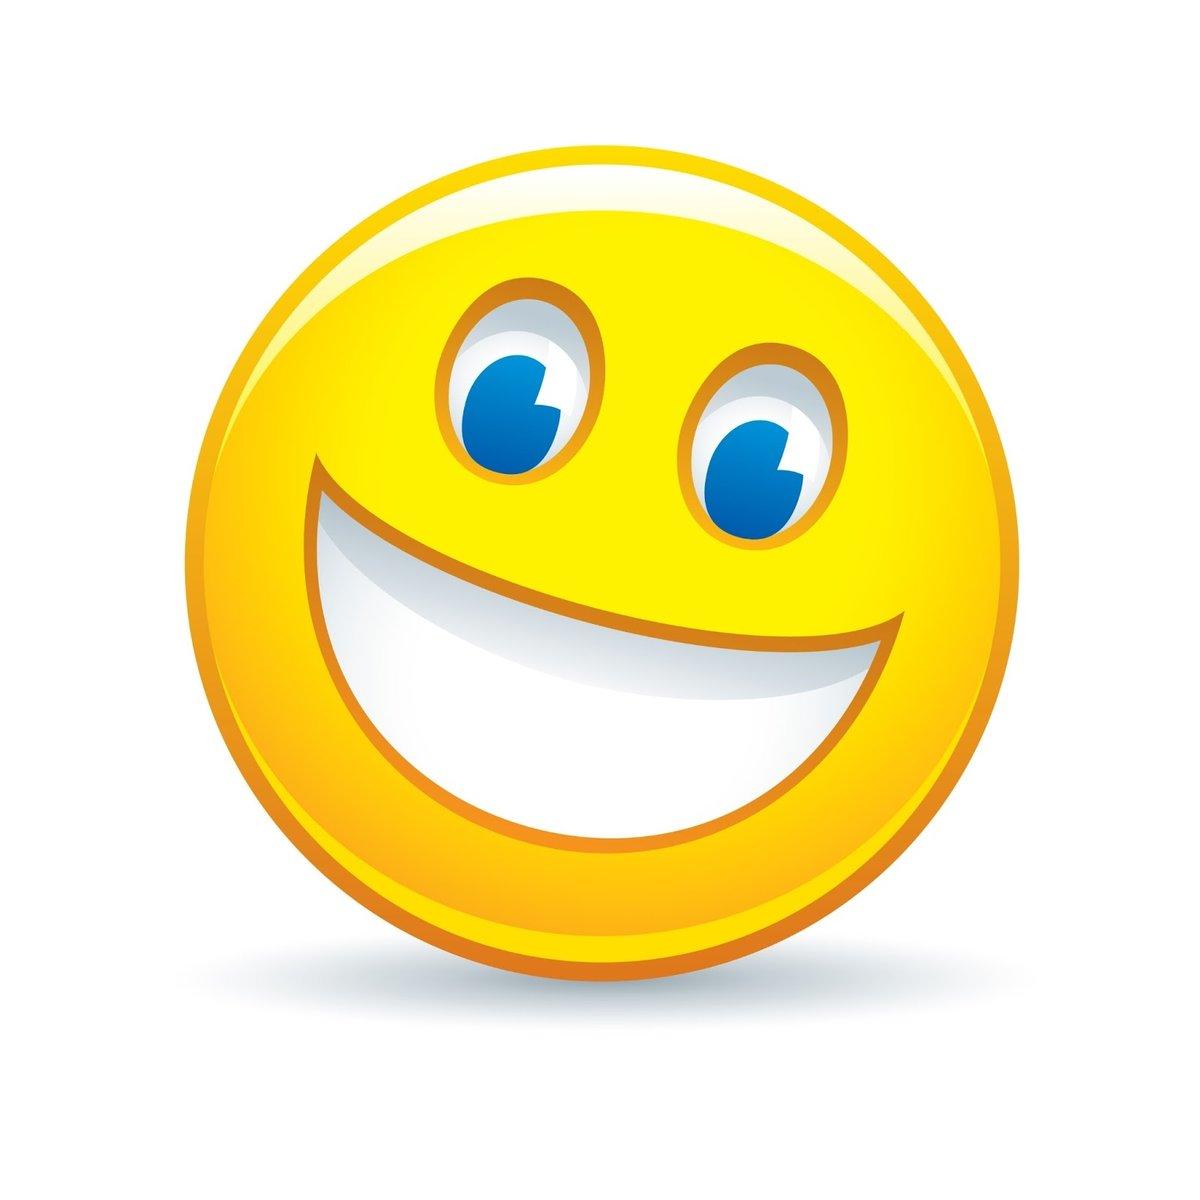 картинки улыбки смайлы картинке серо-бирюзовая, реальности